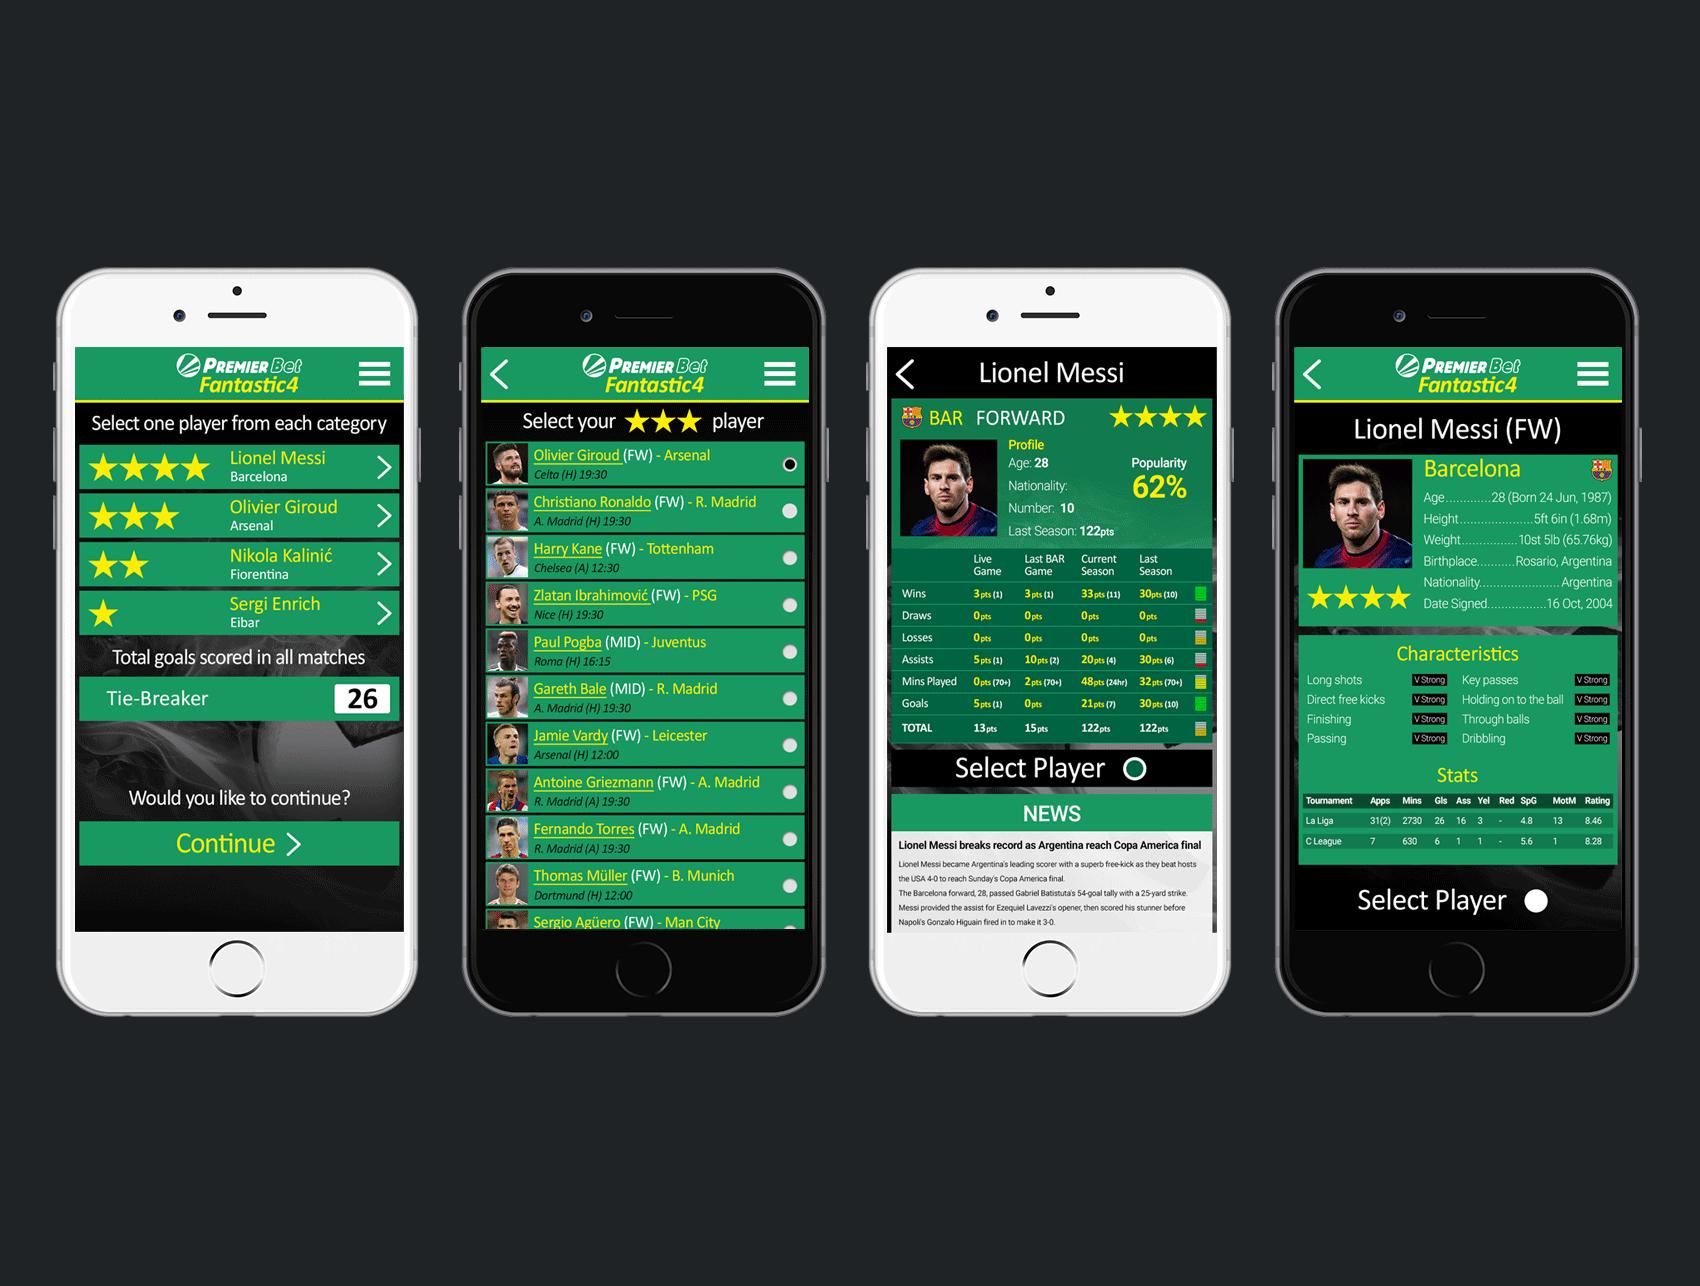 Fantasy Four: Daily Fantasy Game on Mobile